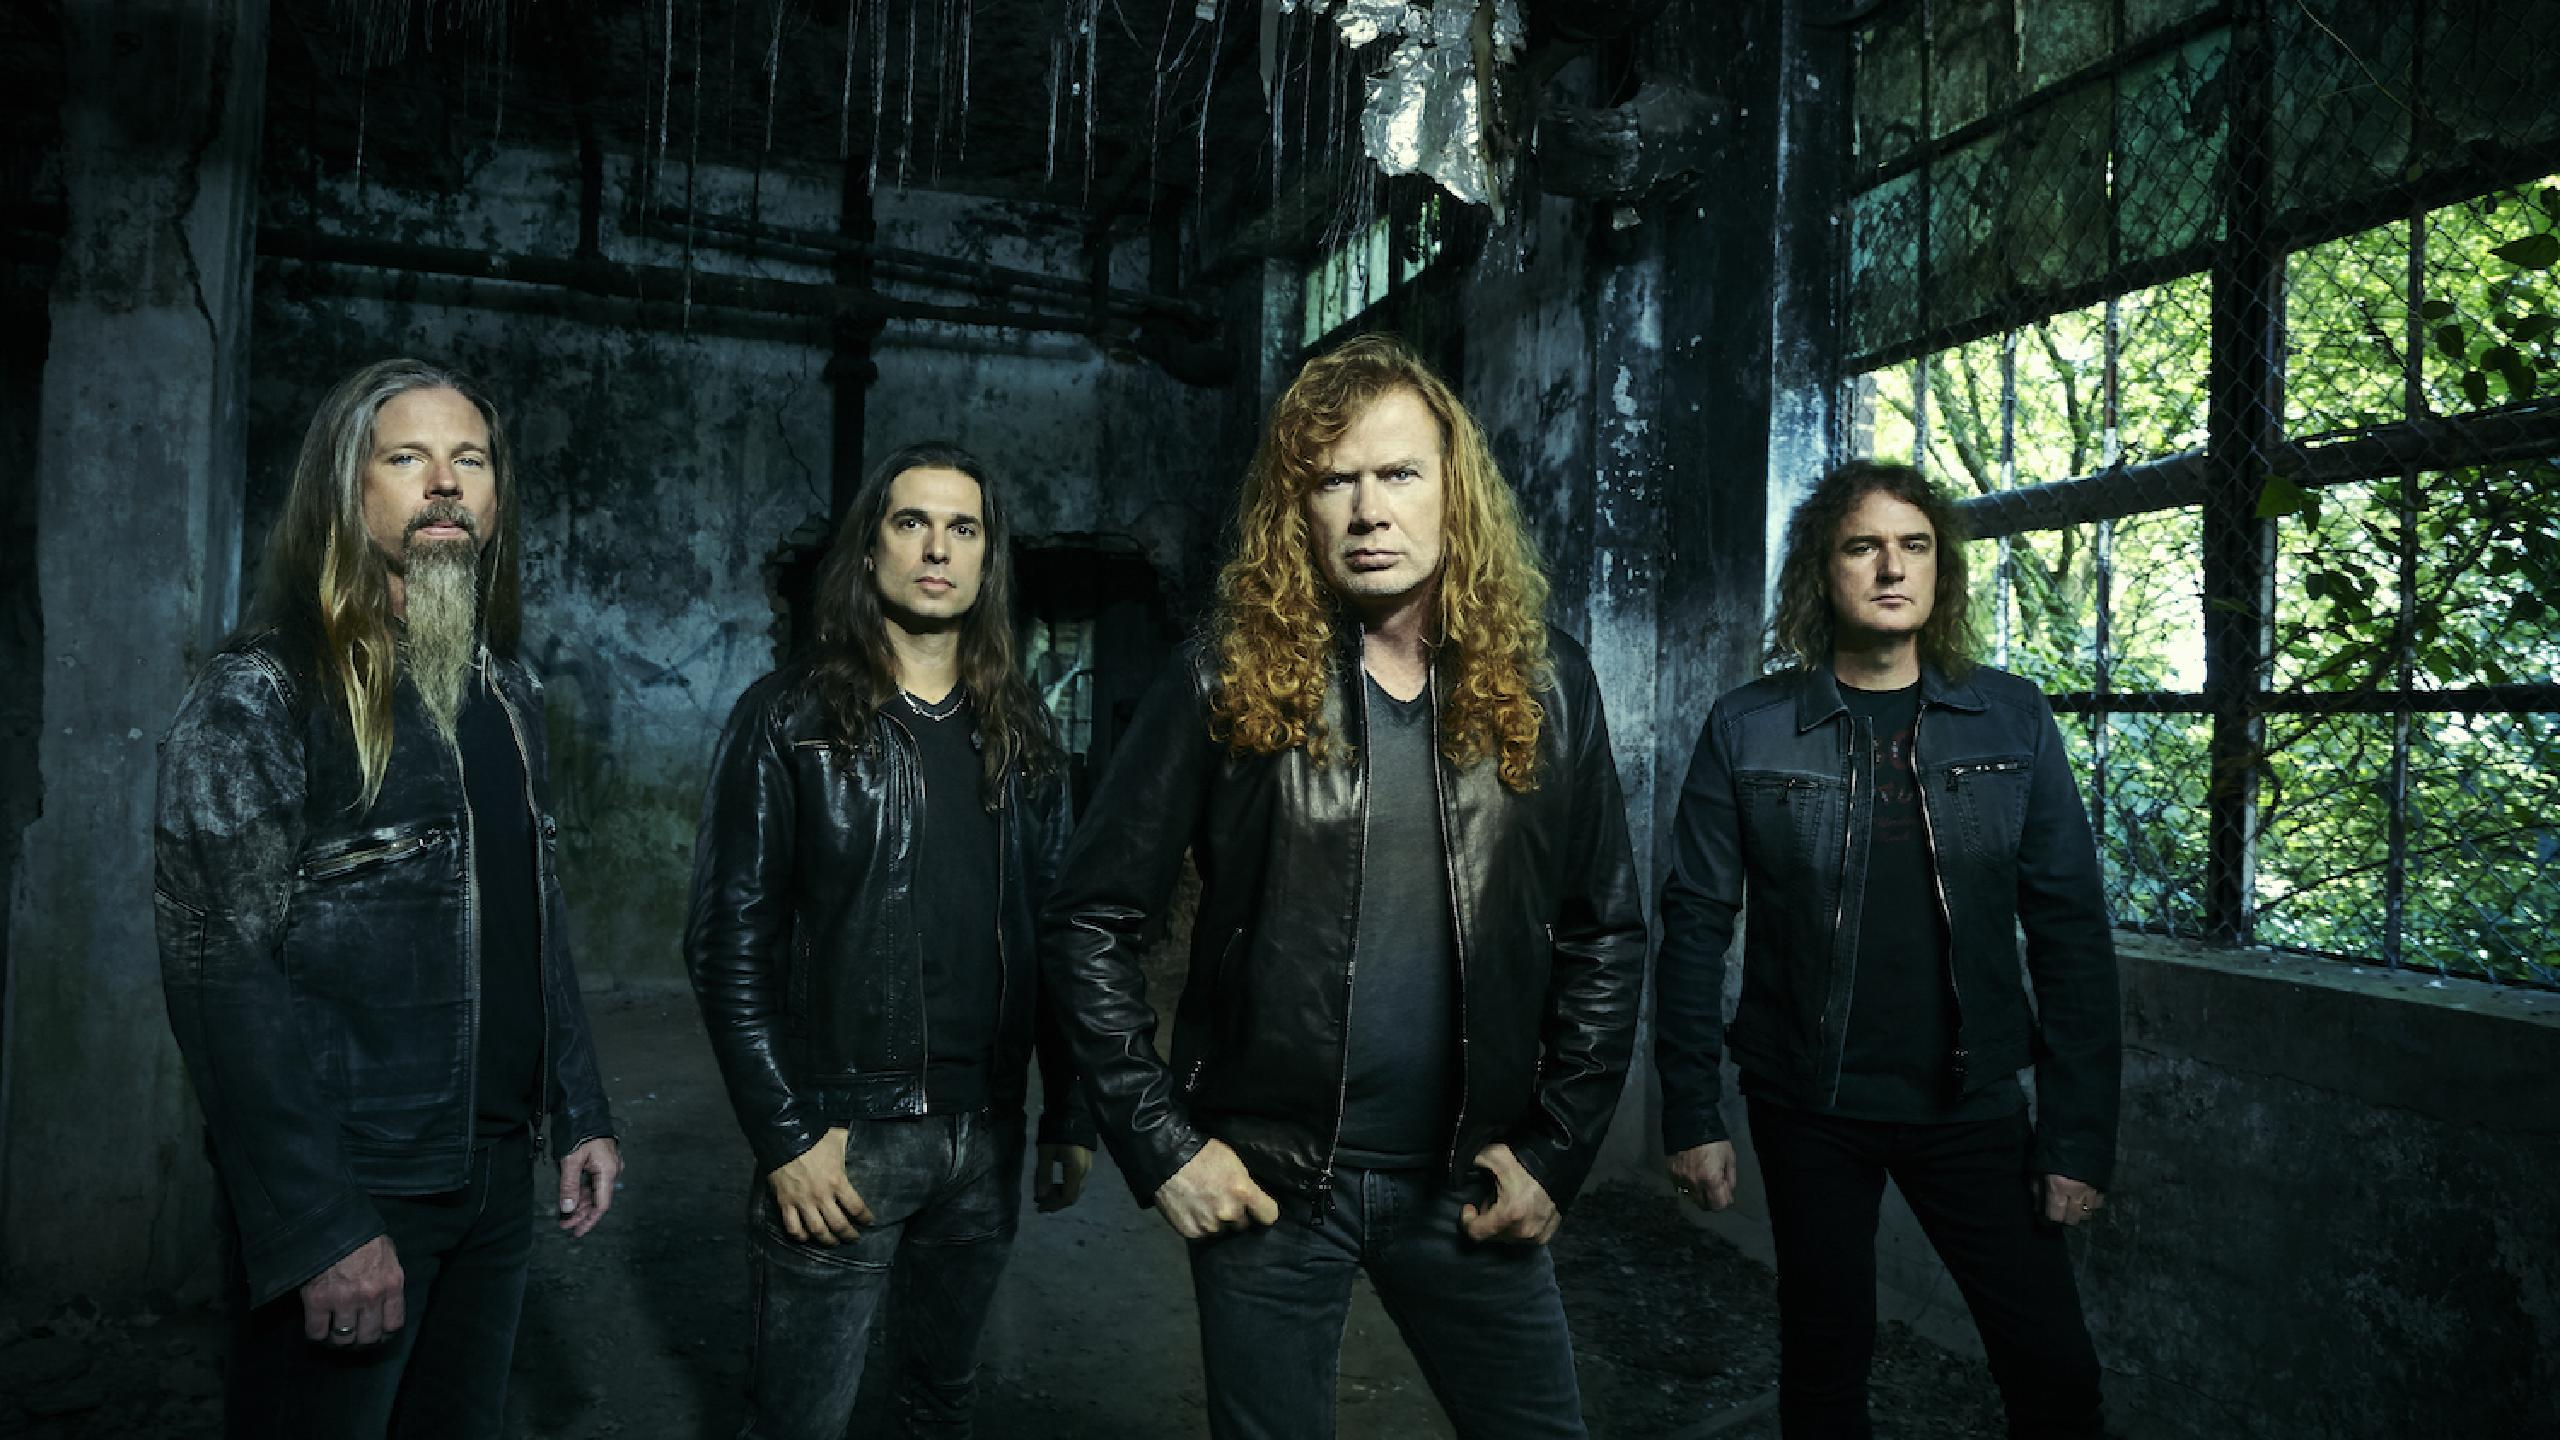 Megadeth fechas de gira 2021 2022. Megadeth entradas y conciertos | Wegow  España